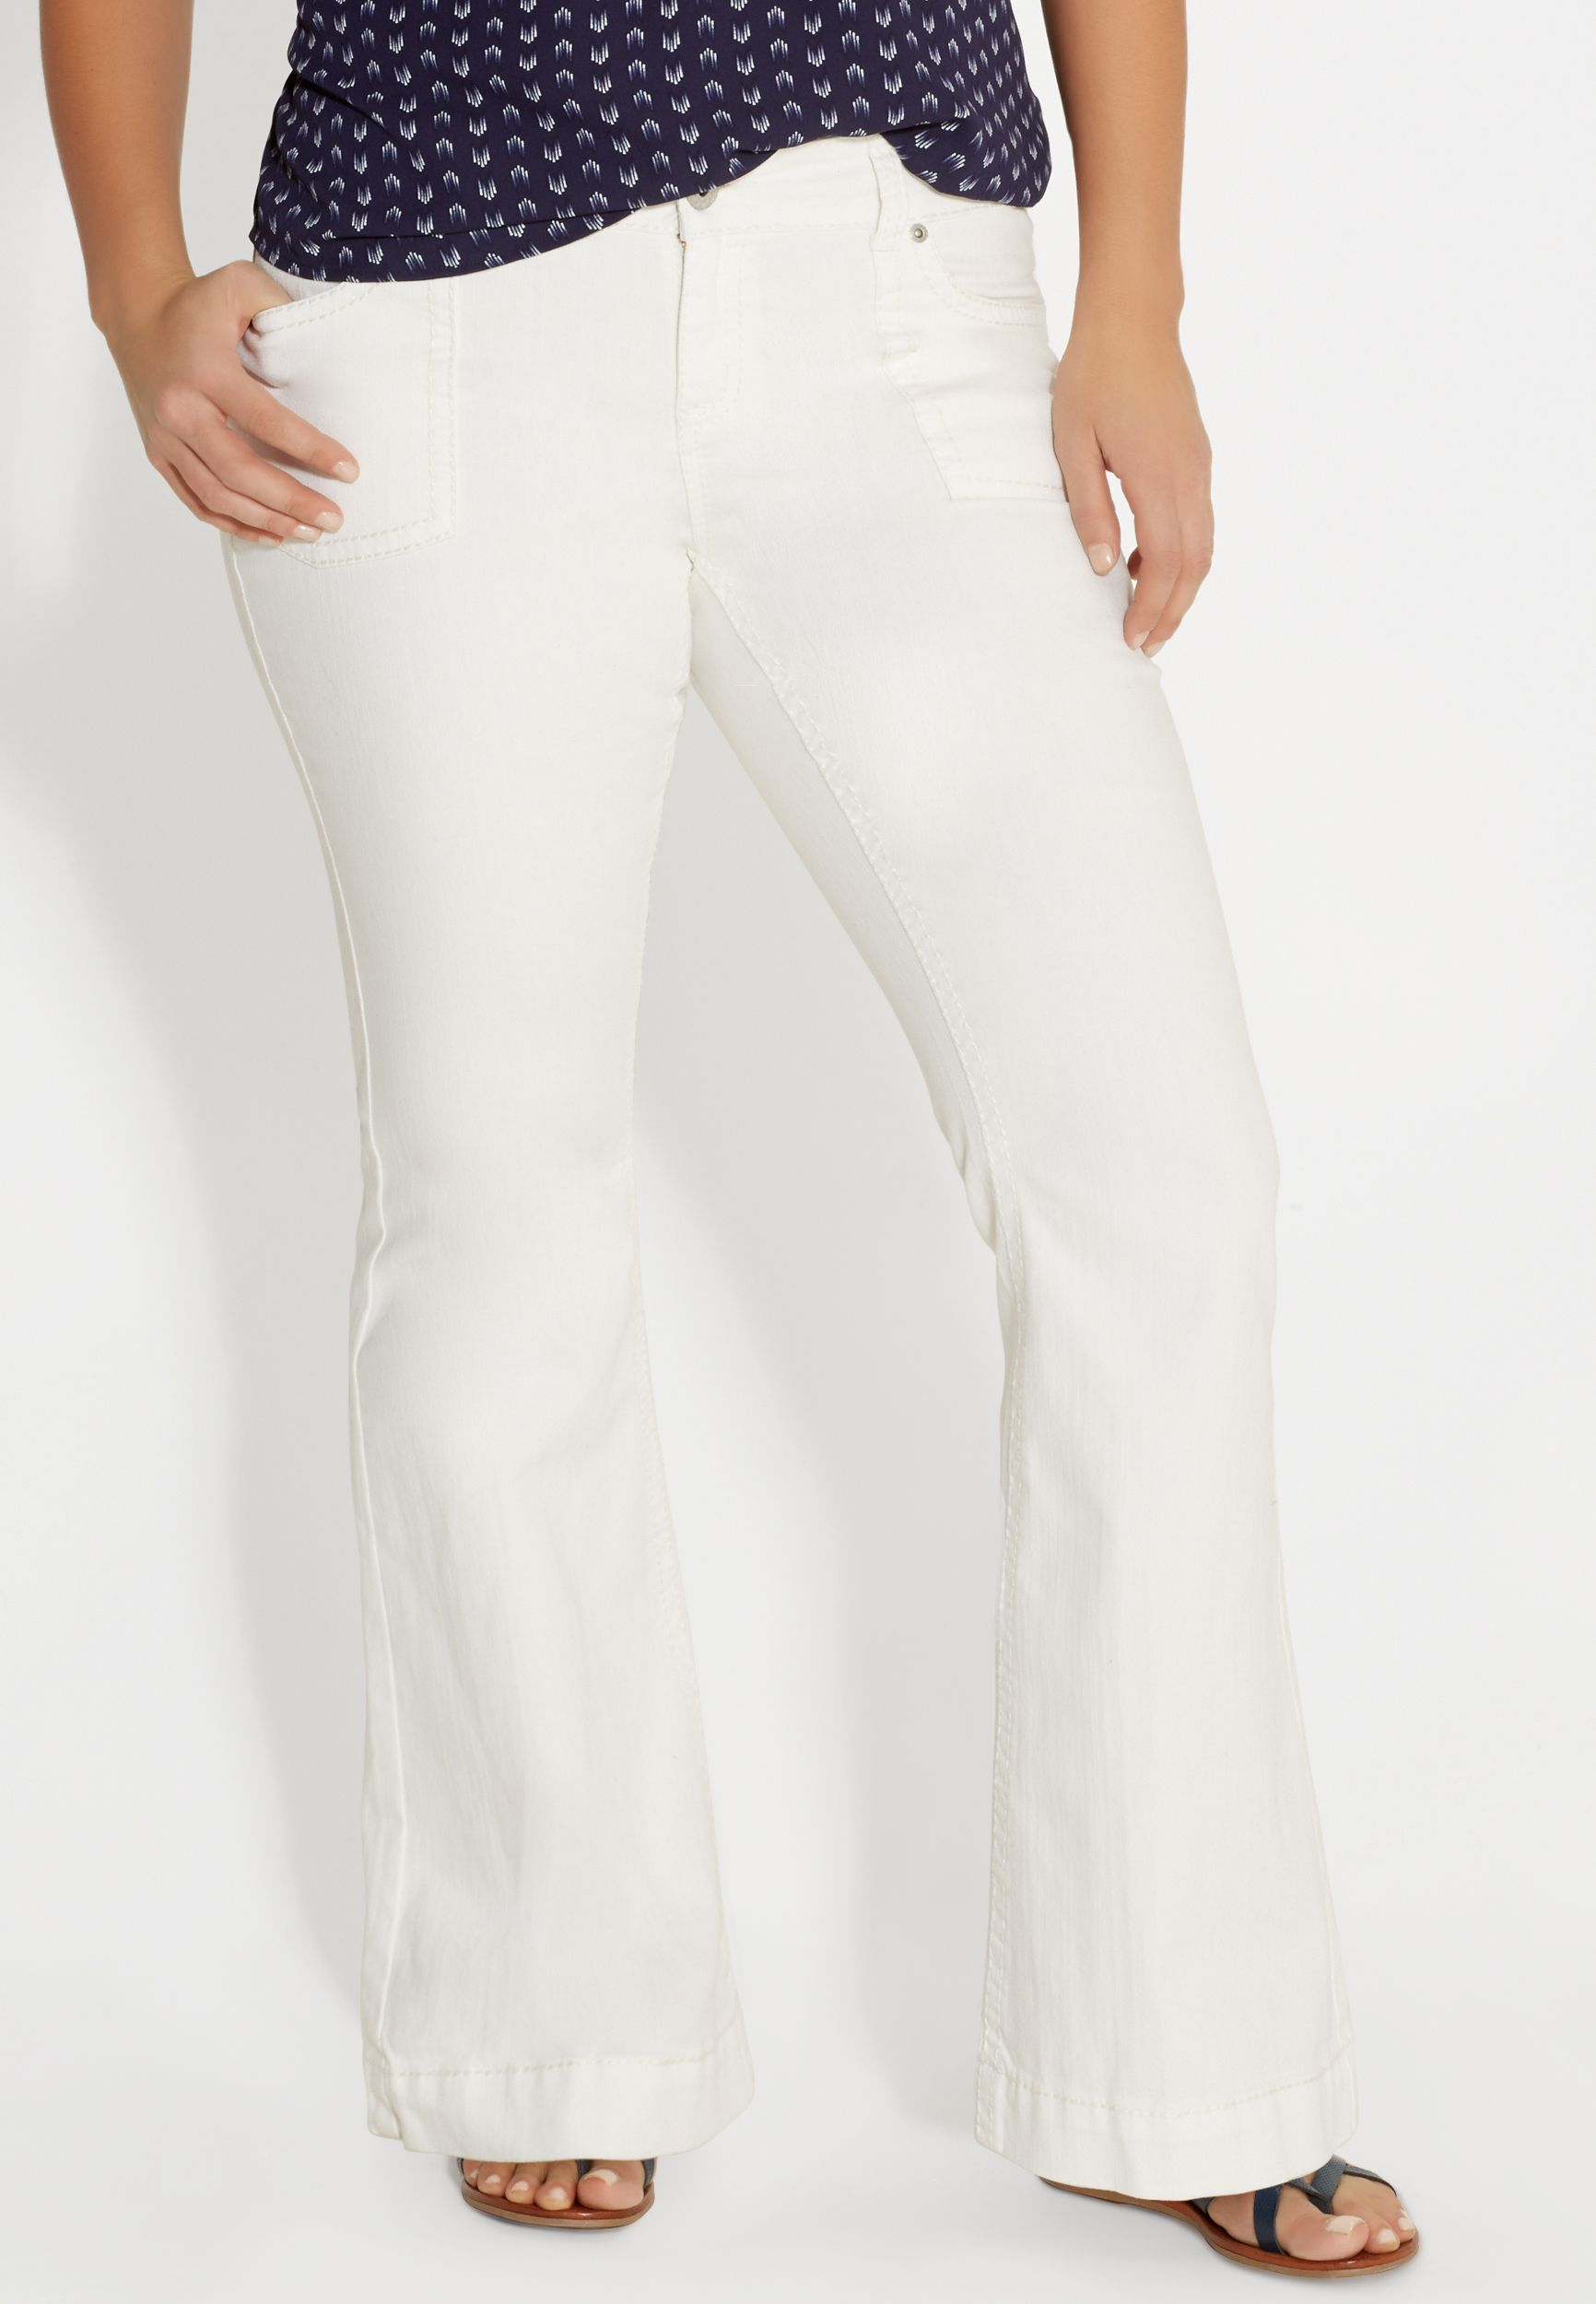 8603c7307ca DenimFlex™ plus size white flare jeans with porkchop pockets (original  price